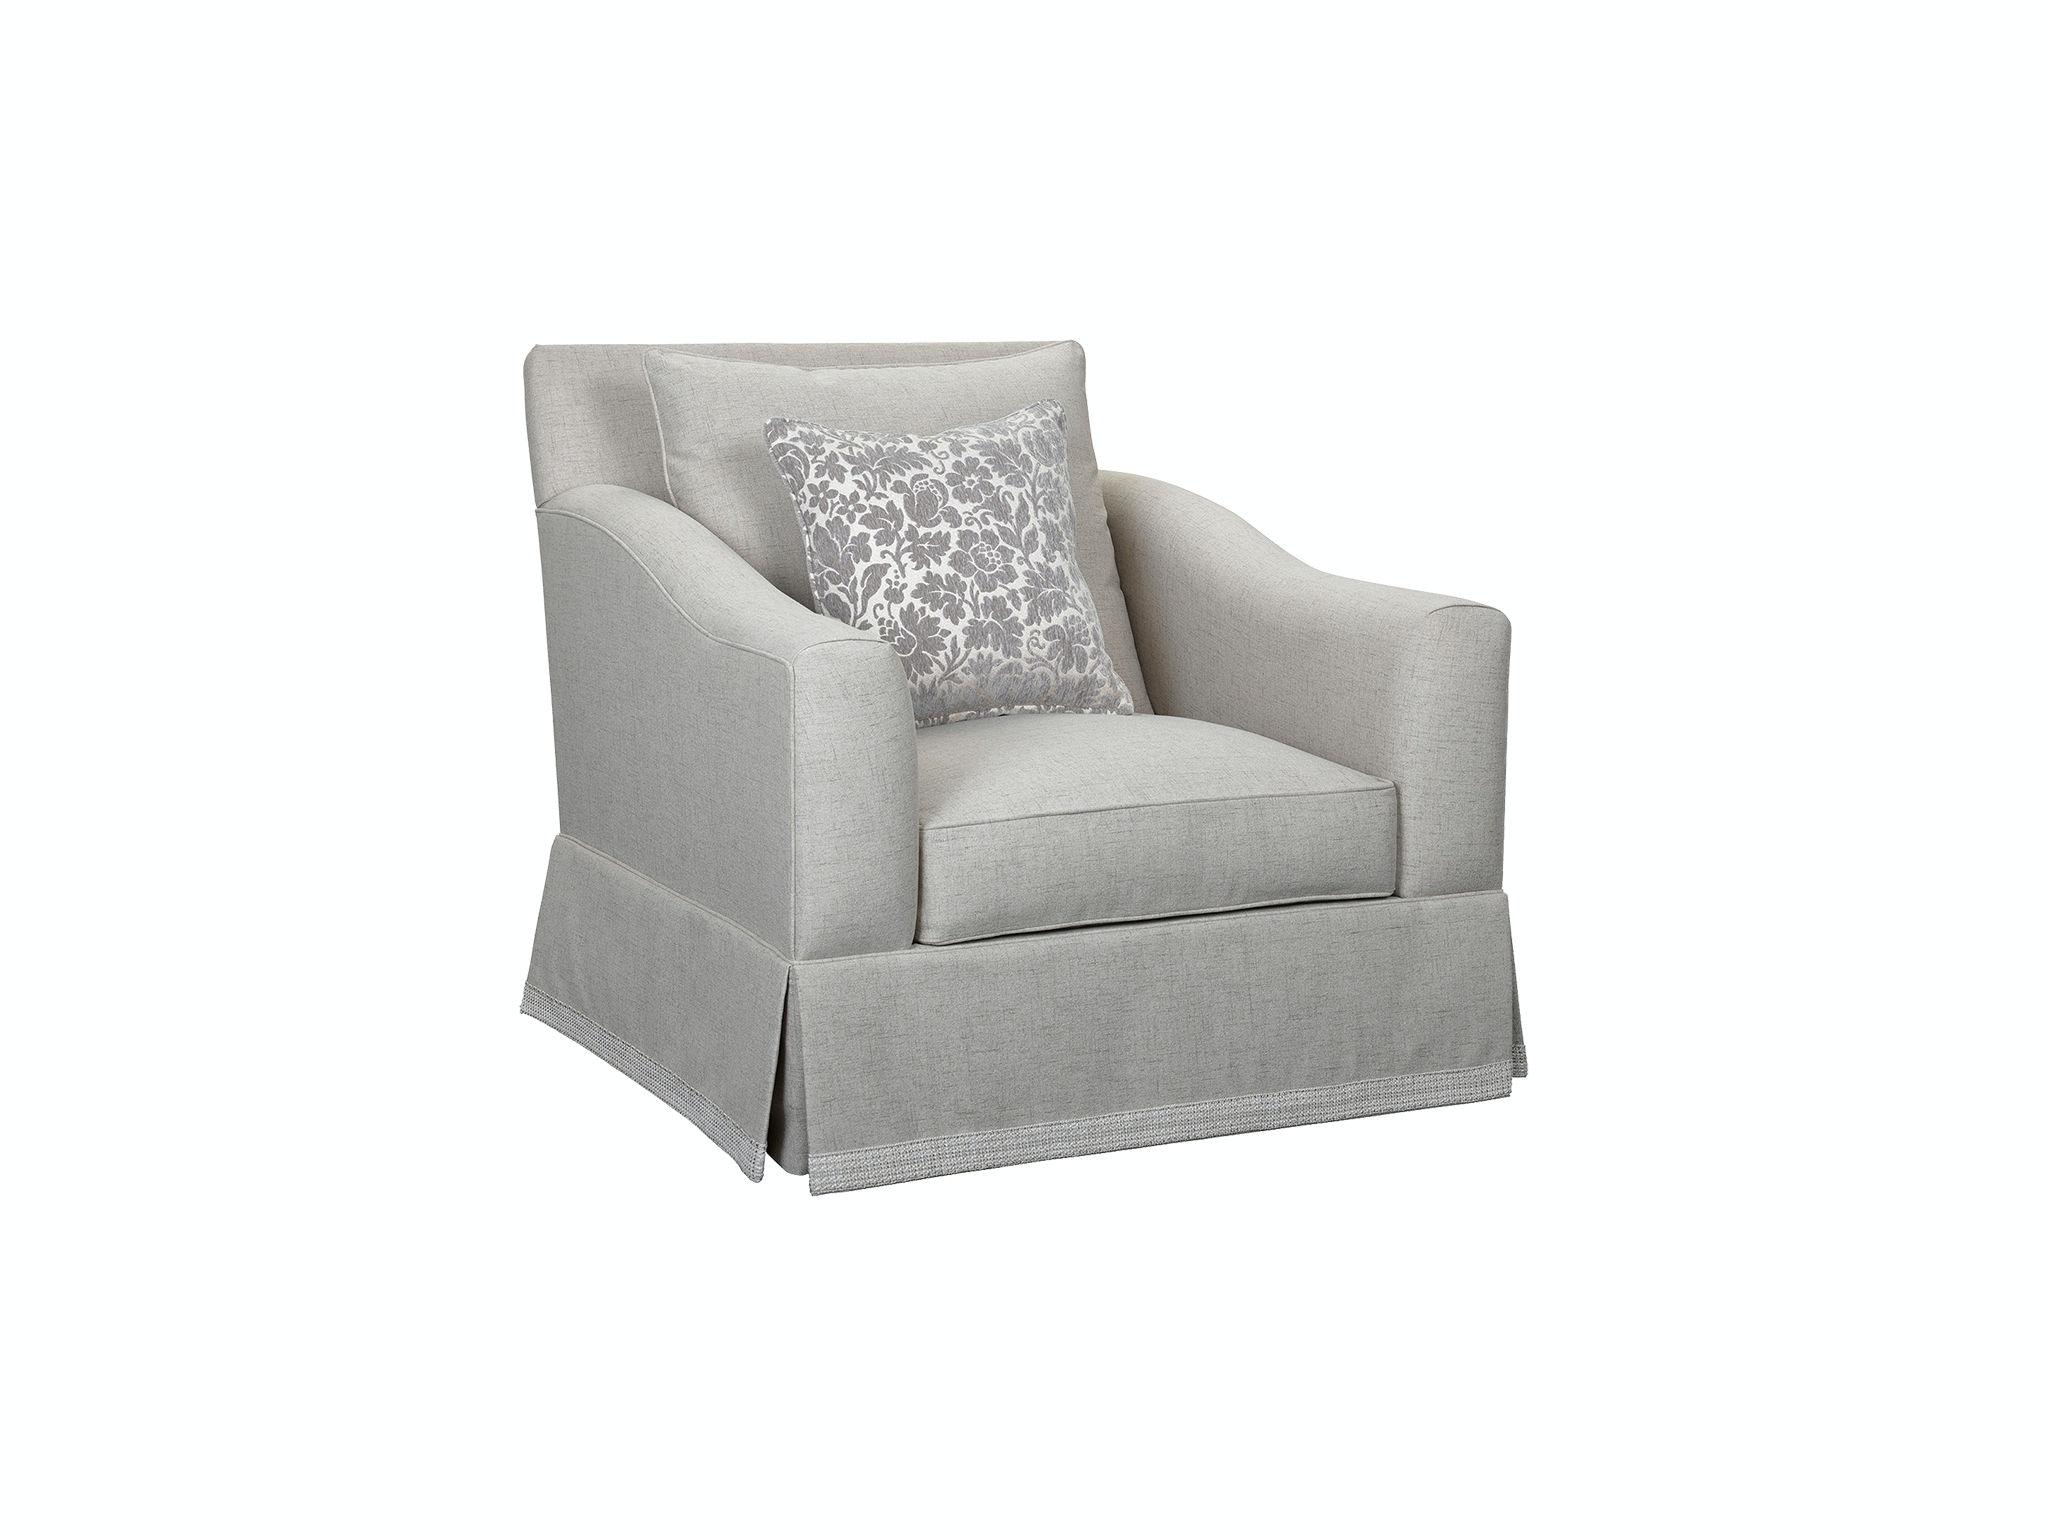 Regina Chair With Border Skirt